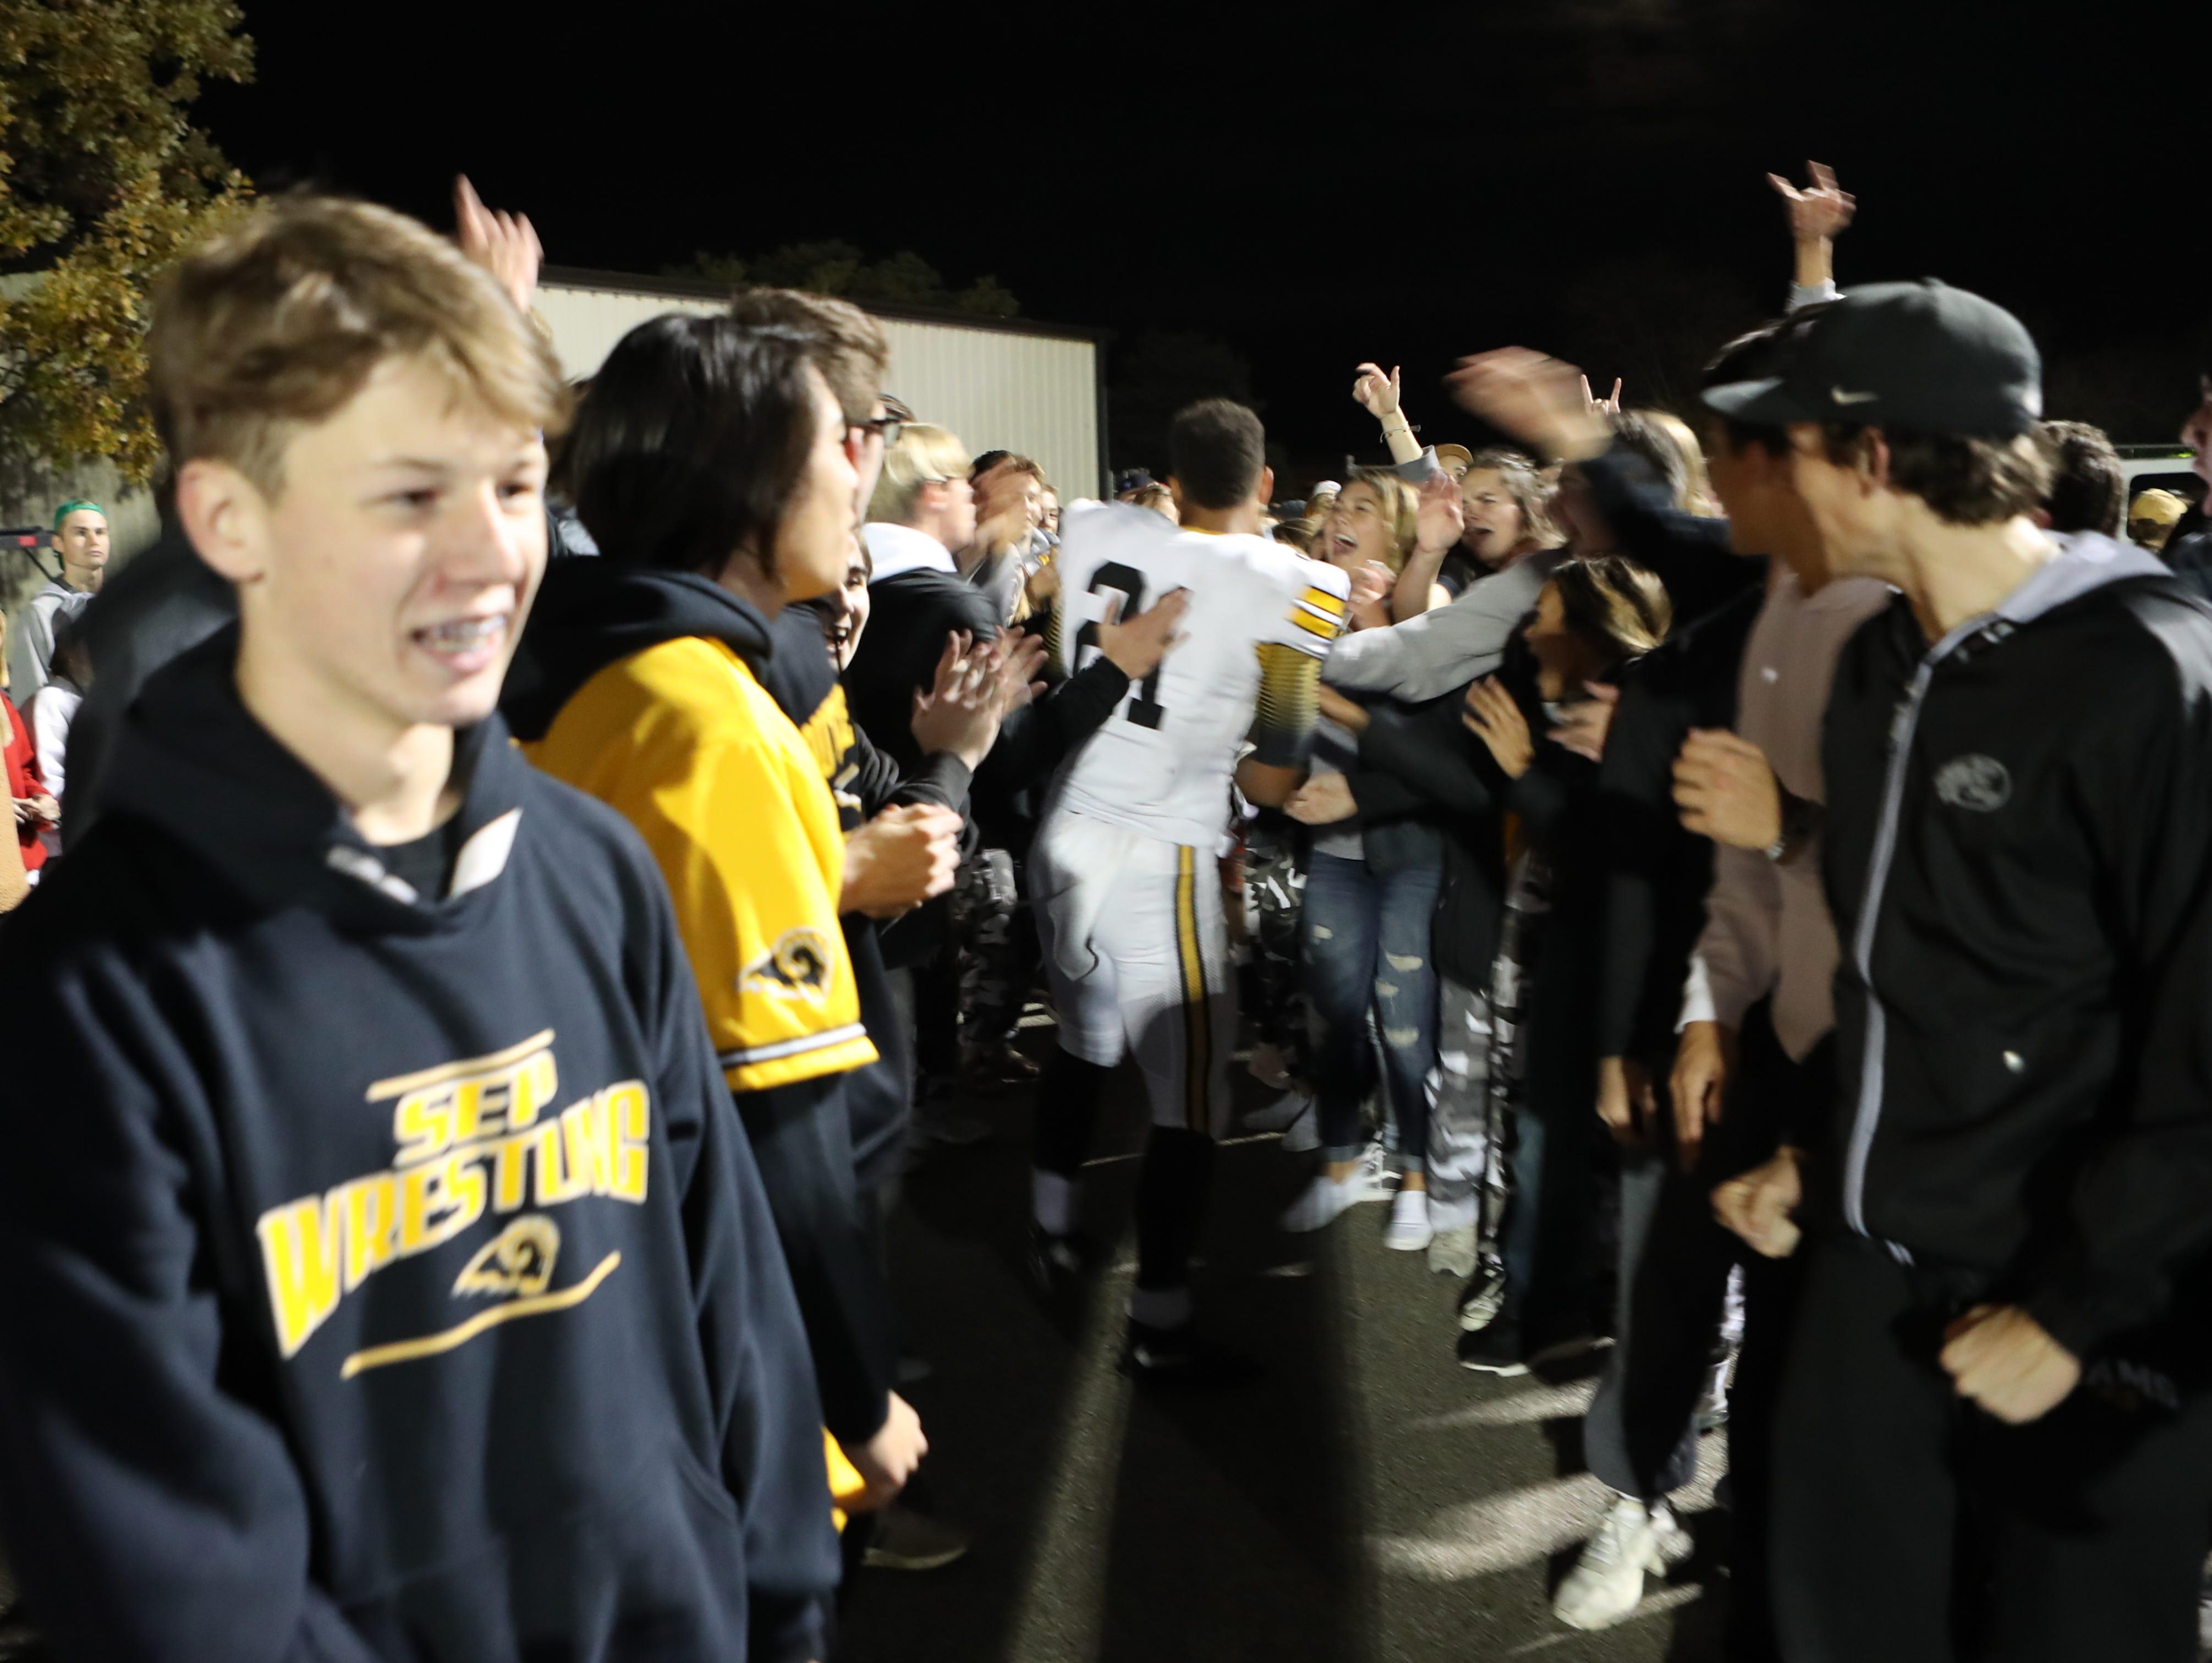 Southeast Polk Rams Gavin Williams (21) walks through happy fans after the Rams beat the Ankeny Centennial Jaguars at Ankeny football stadium.